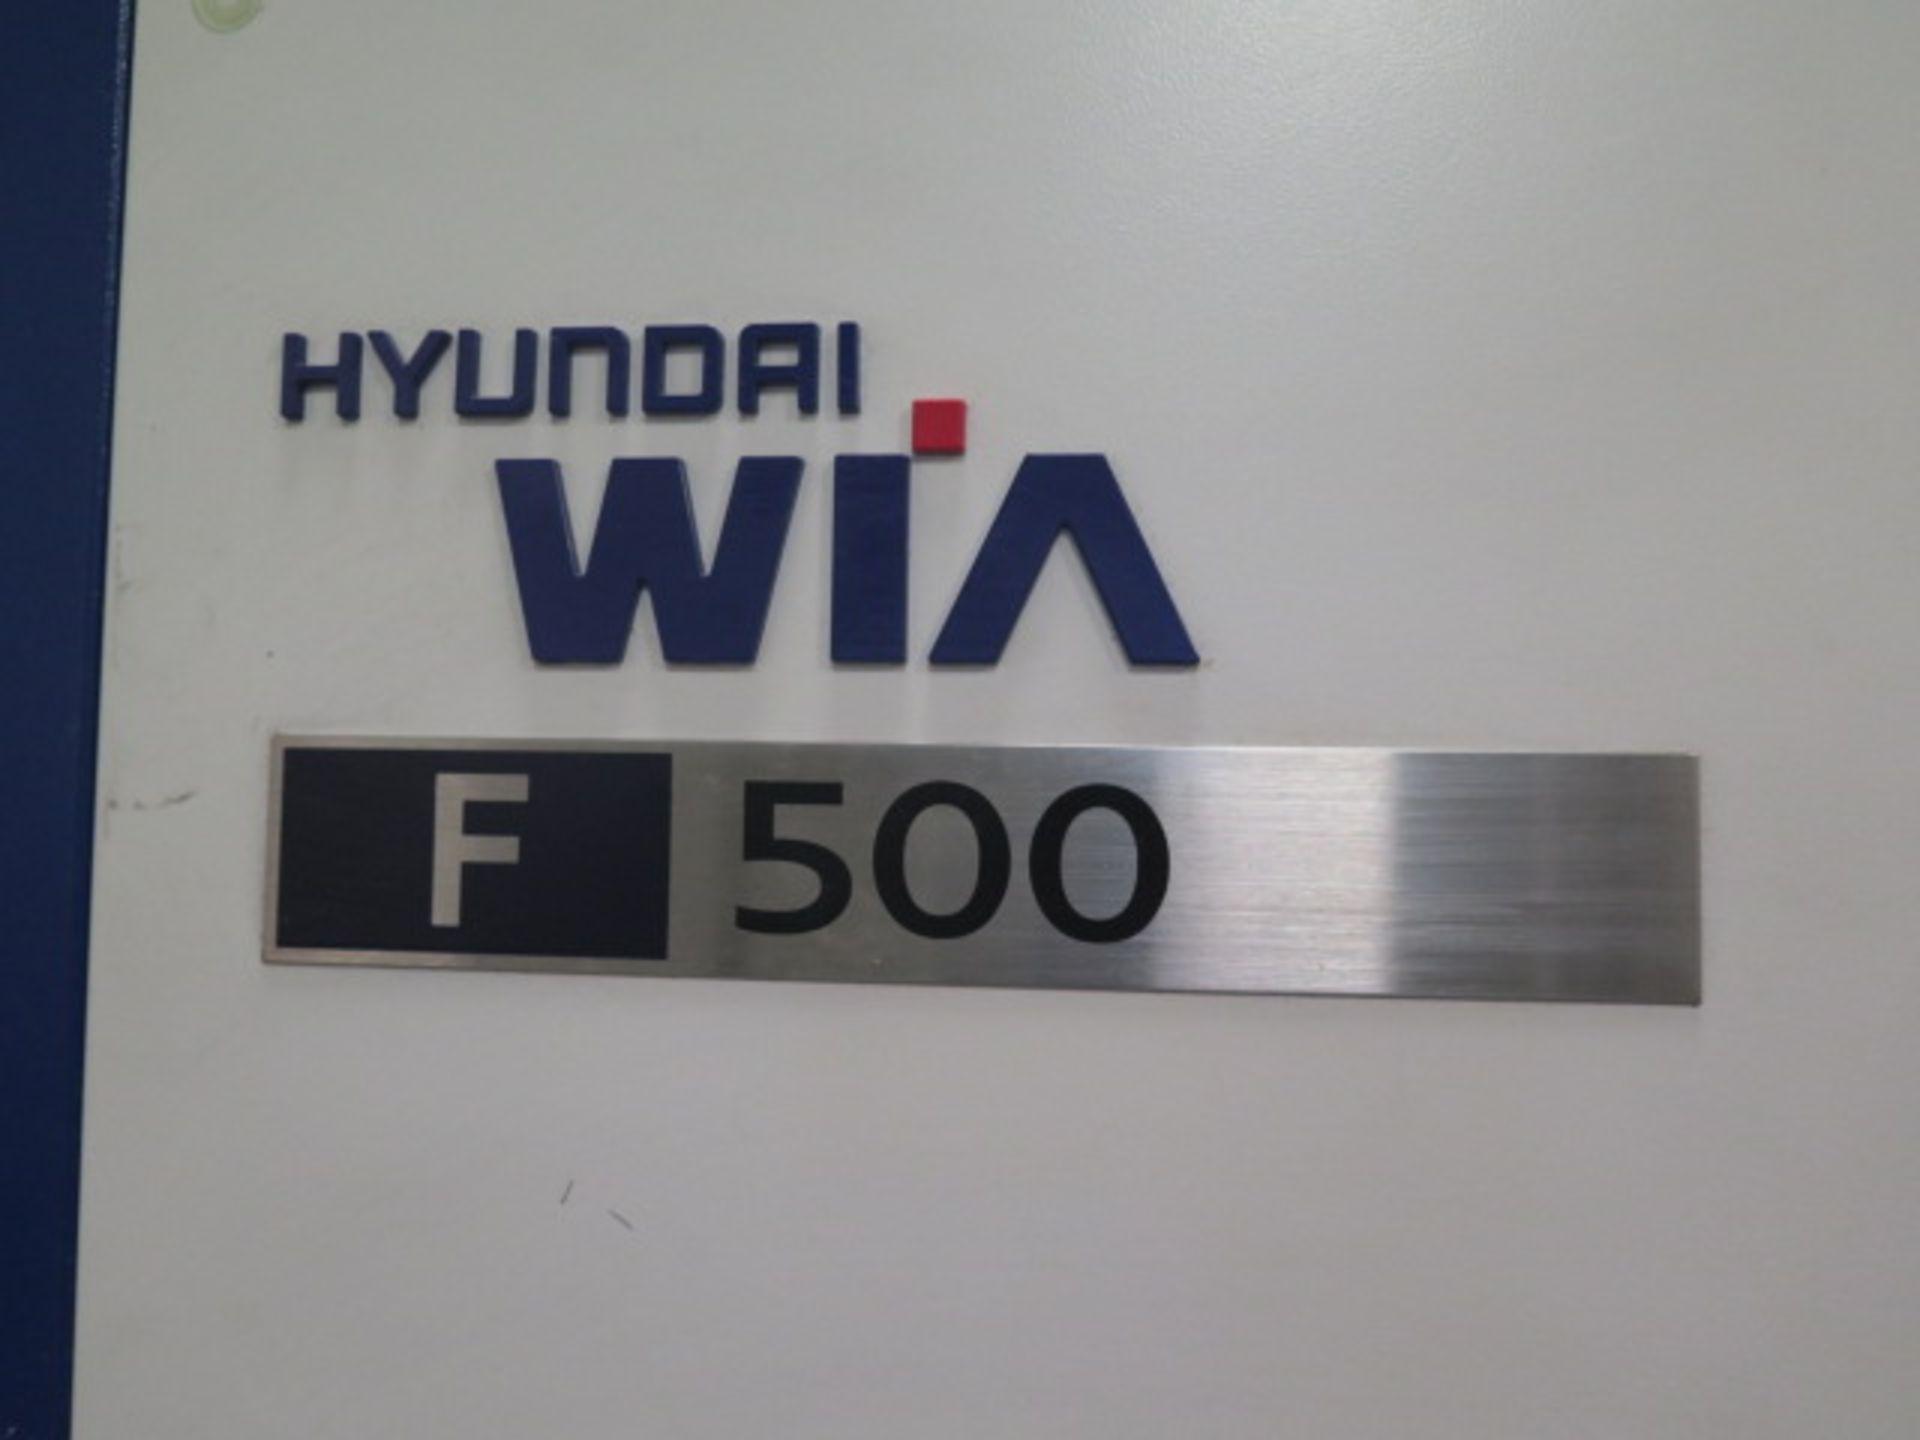 2016 Hyundai WIA F500 4-Axis CNC VMC s/n G3684-3457 w/ Hyundai WIA Fanuc i- Series, SOLD AS IS - Image 4 of 22